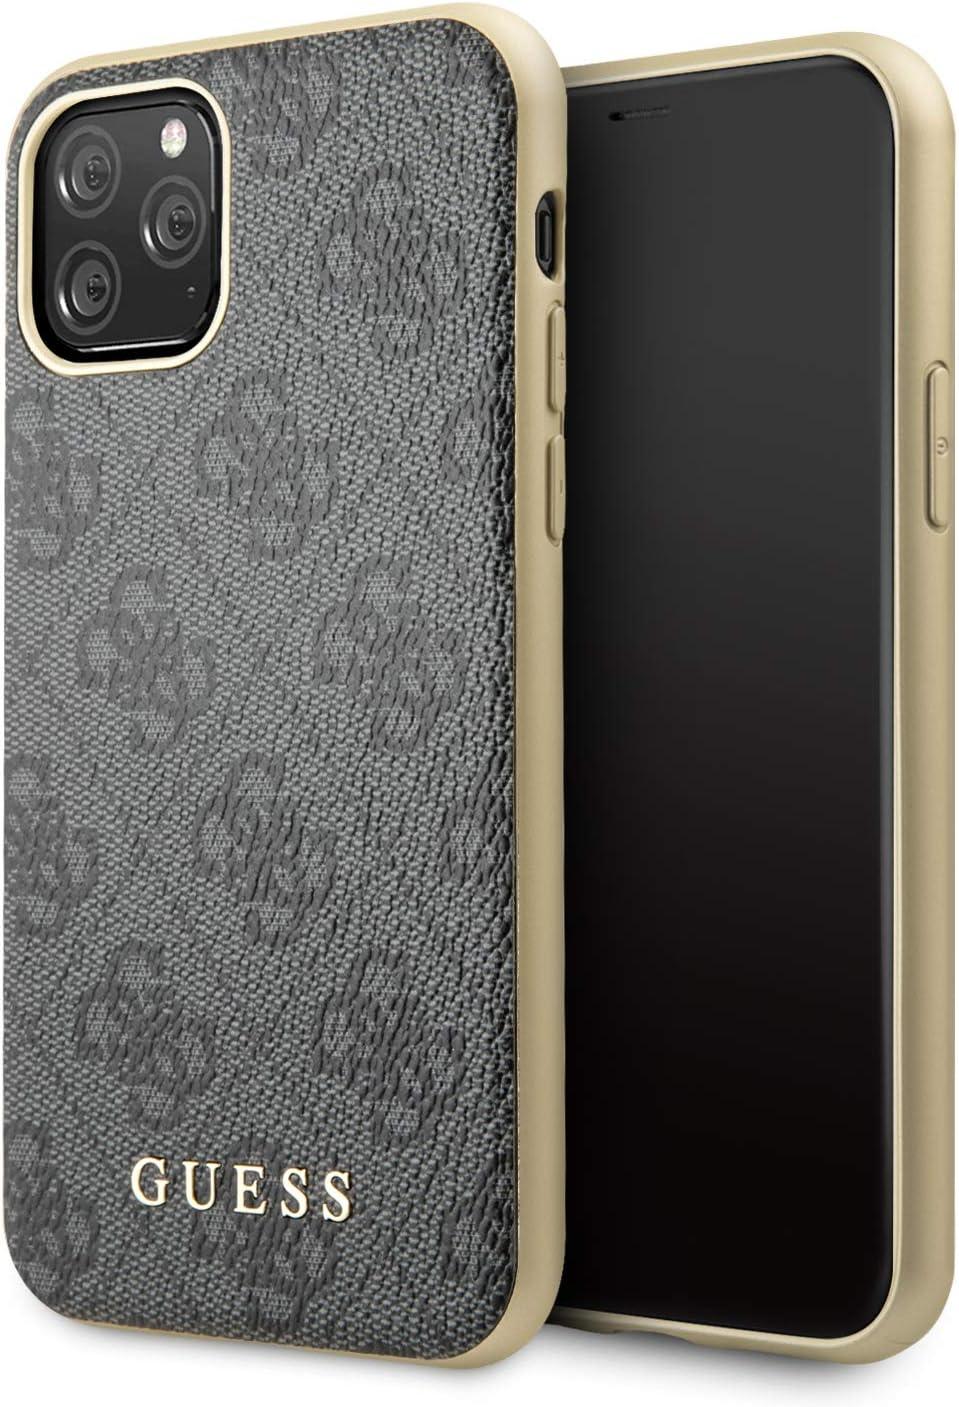 Guess GUHCN65G4GG - Carcasa para iPhone 11 Pro MAX, Color Gris